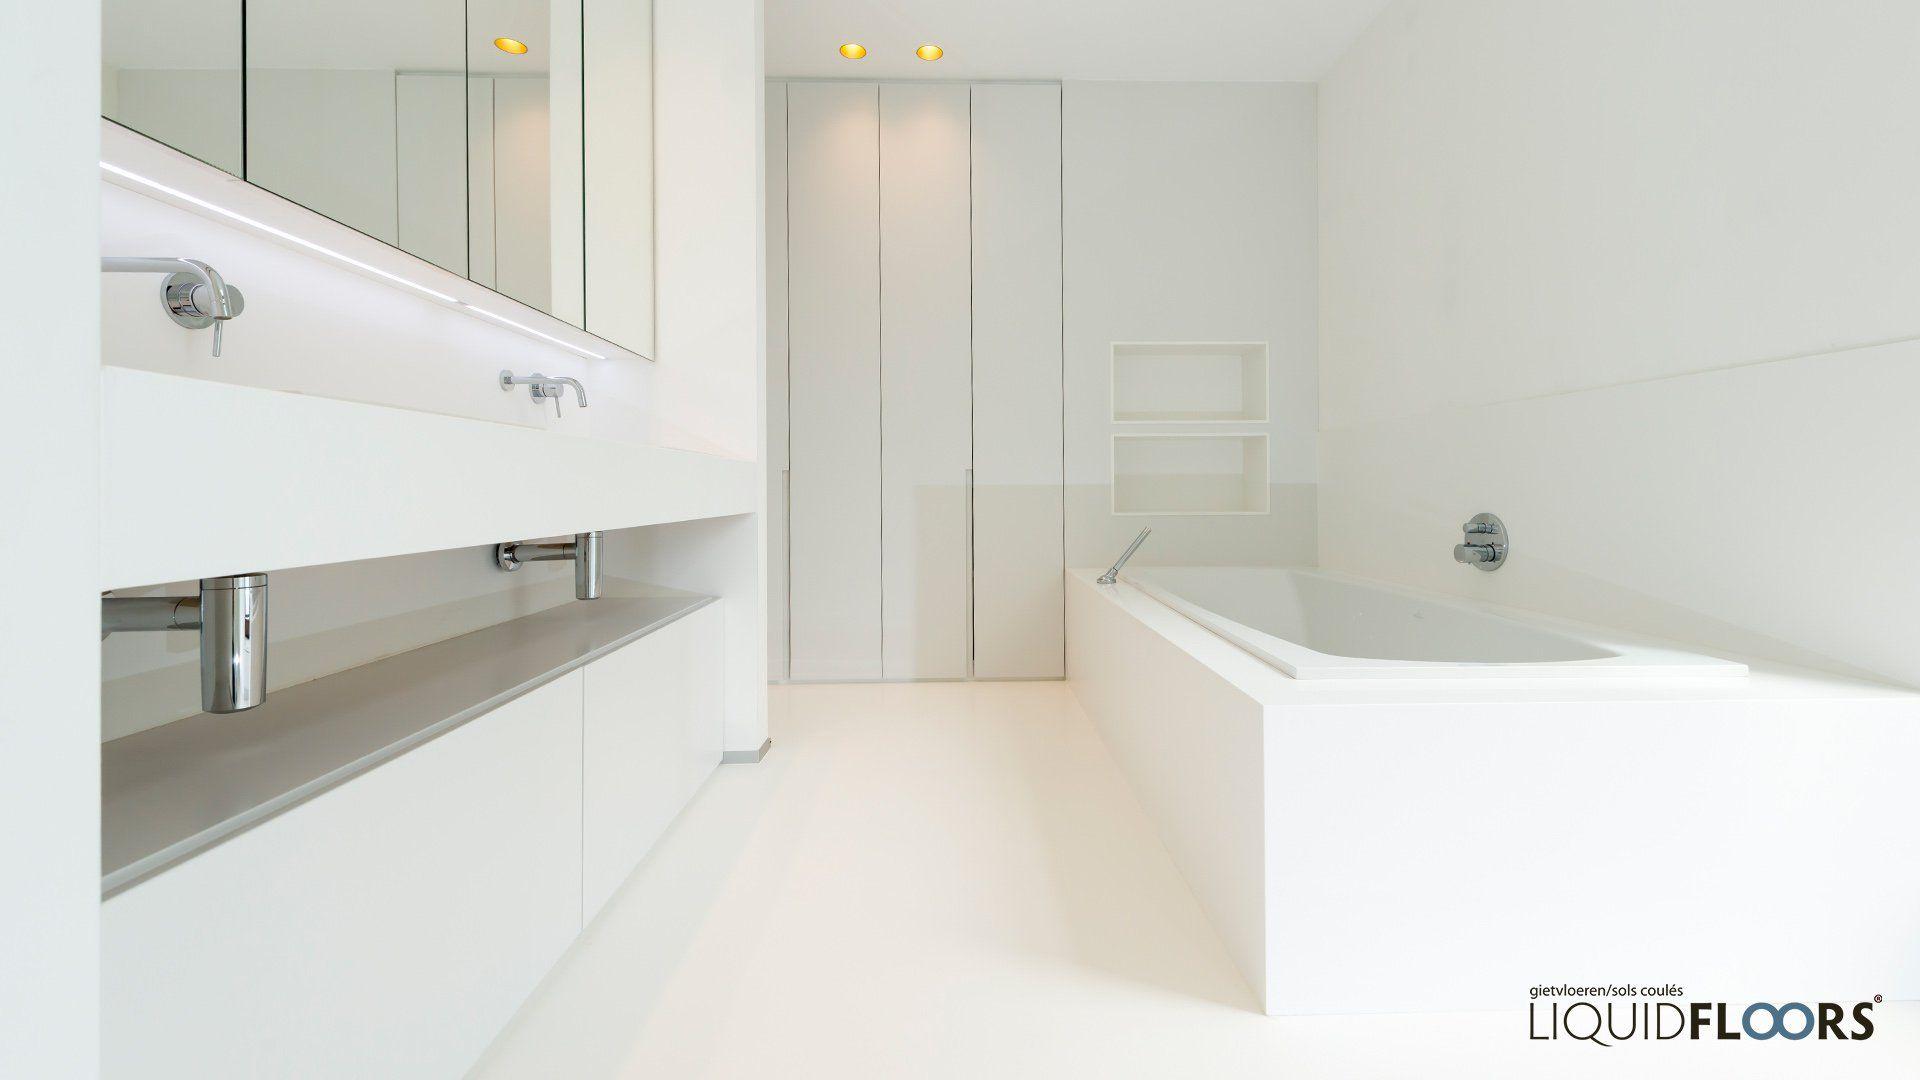 Gietvloer Voor Badkamer : Gietvloer badkamer liquidfloors badkamer pinterest searching